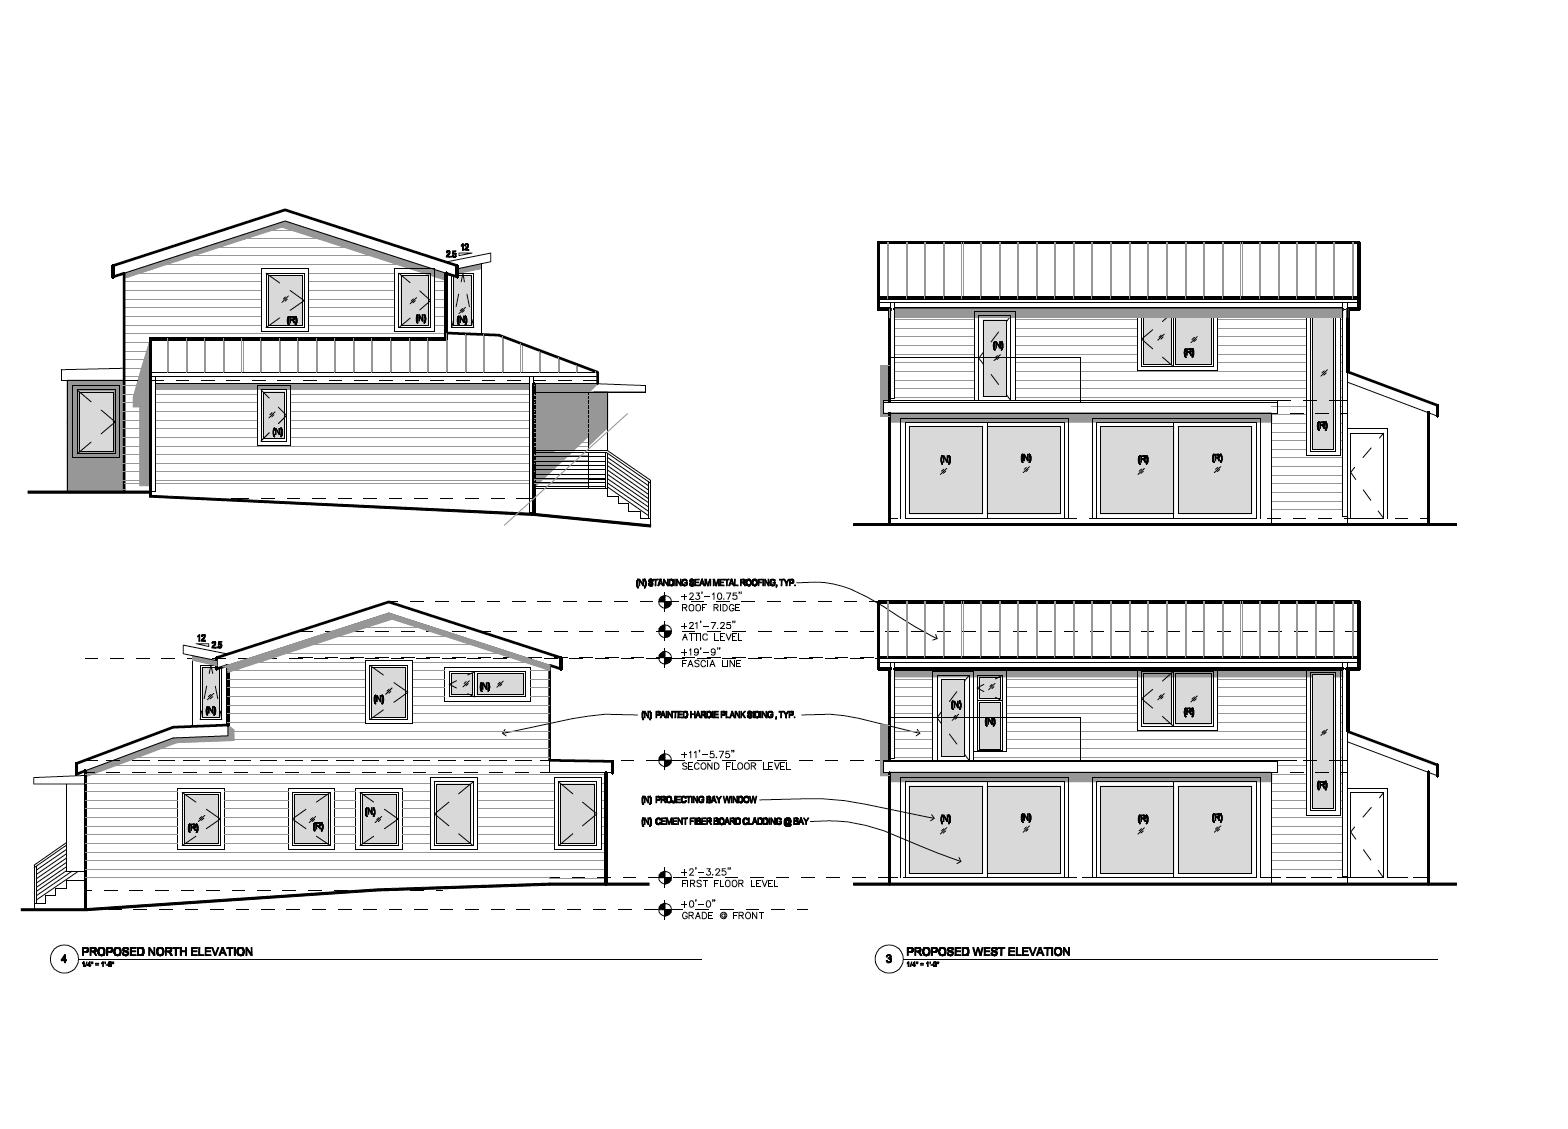 Roof Art Schematics Amp 555 Timer Circuit Diagram Police